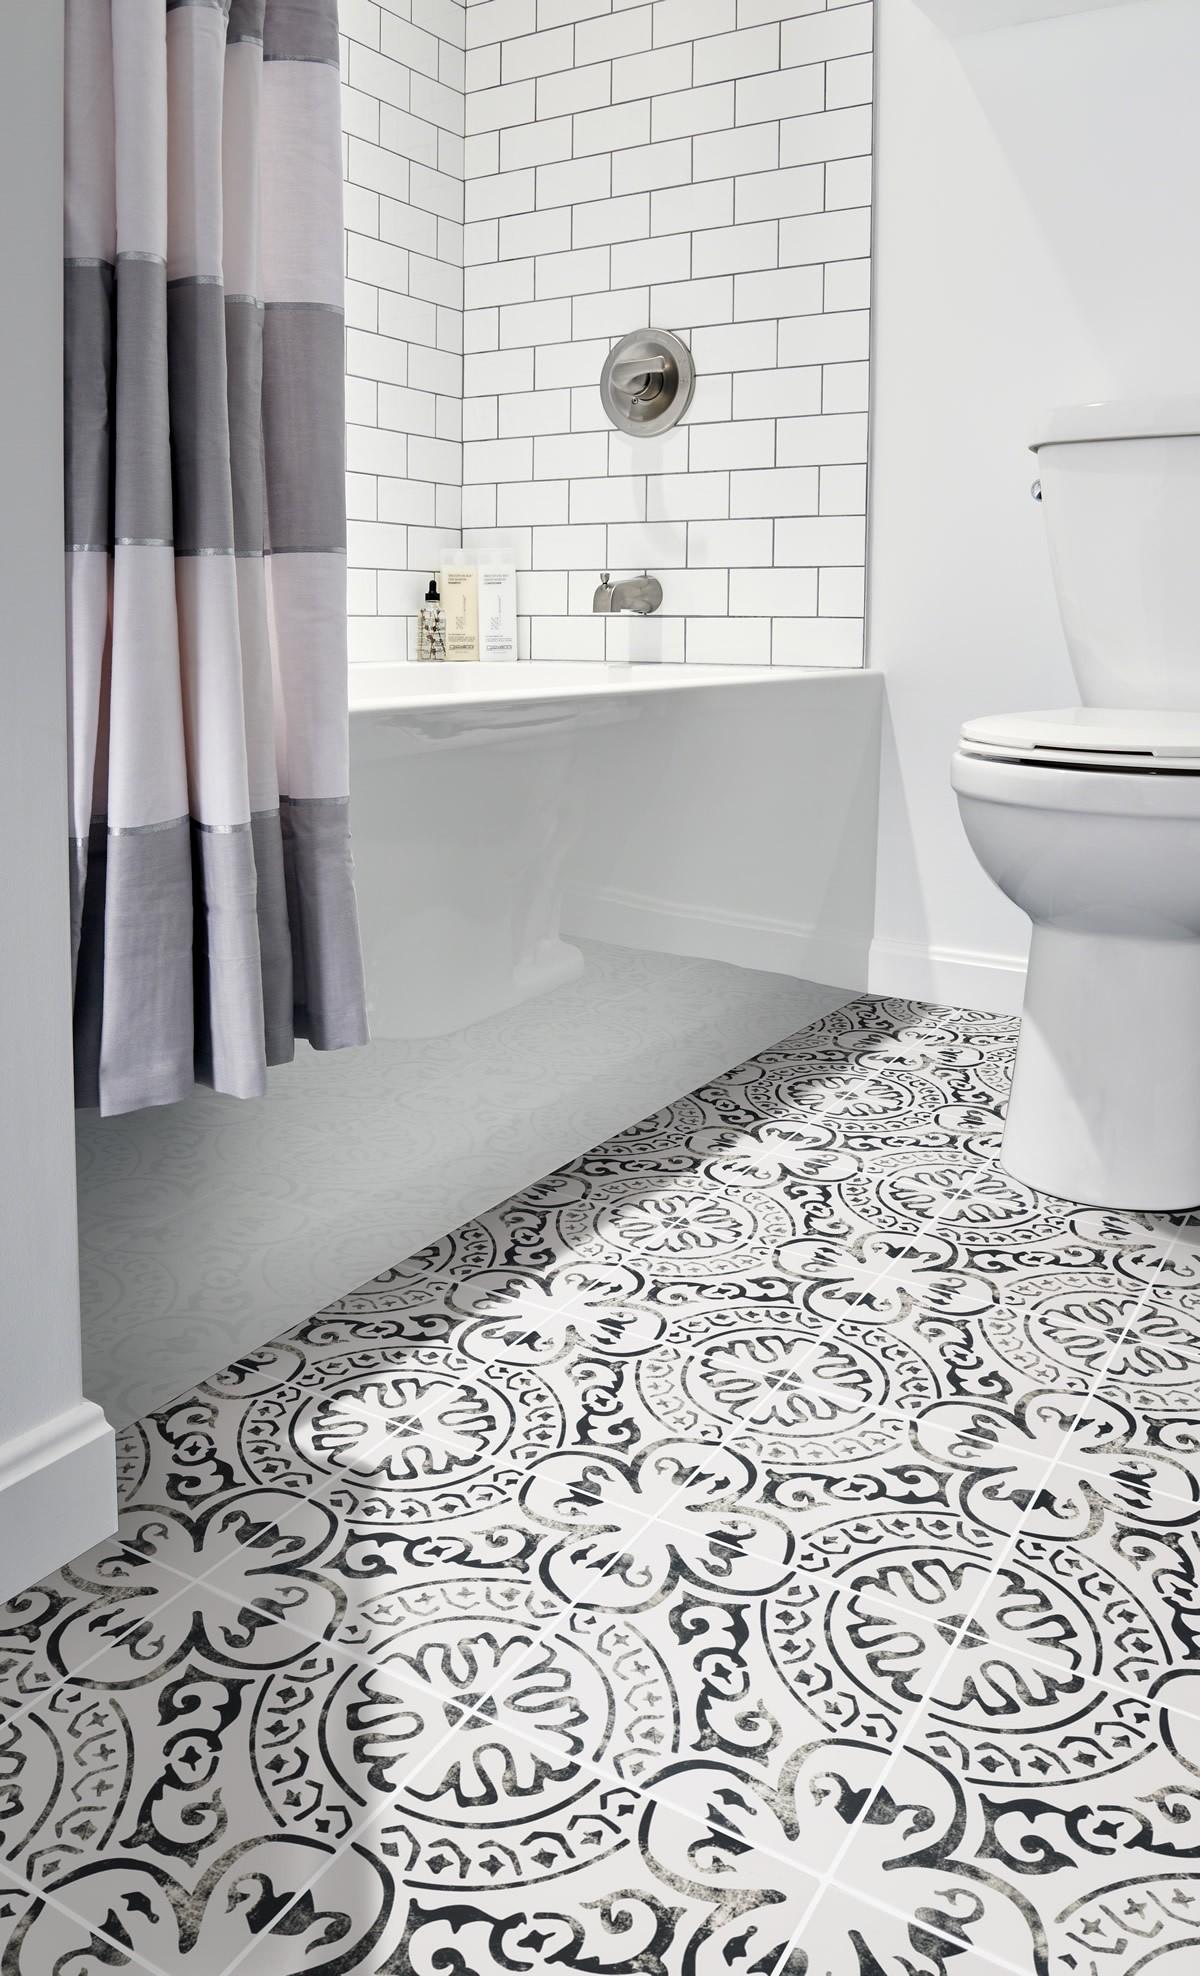 Kenzzi Paloma 8x8 Upscape Tile